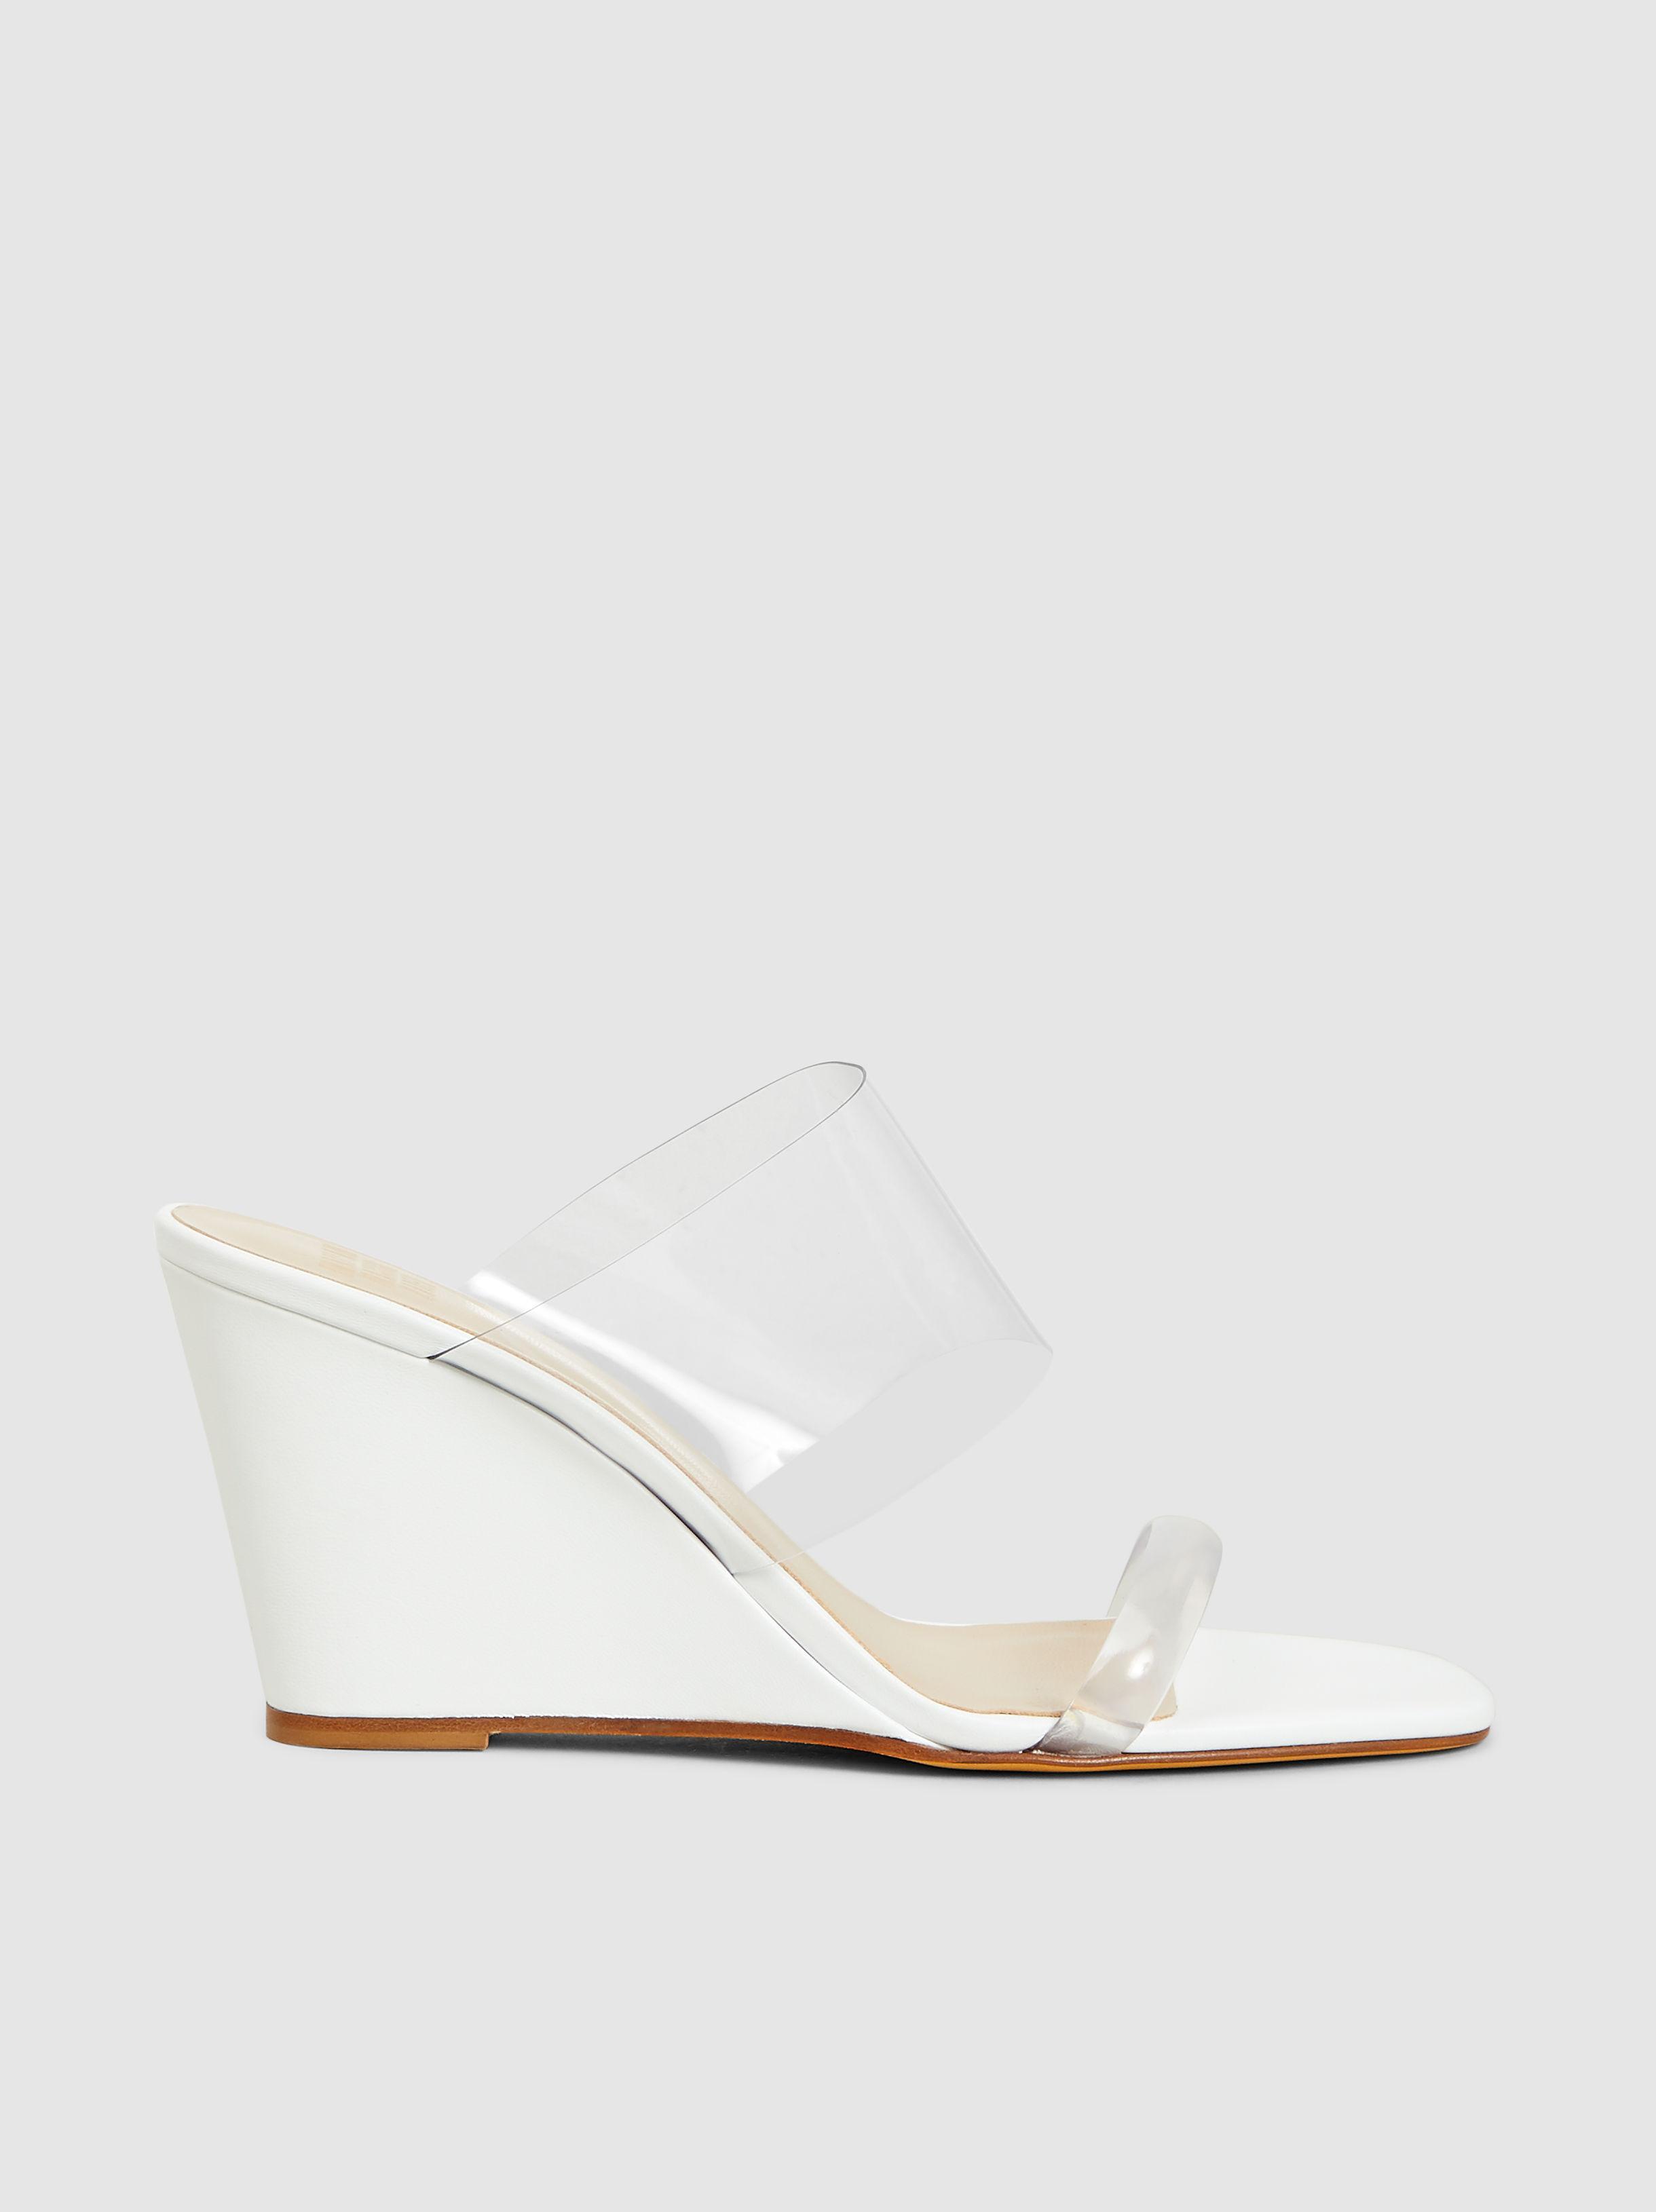 c5542bcbda9 Maryam Nassir Zadeh. Women s White Olympia Patent-leather And Pvc Wedge  Sandals